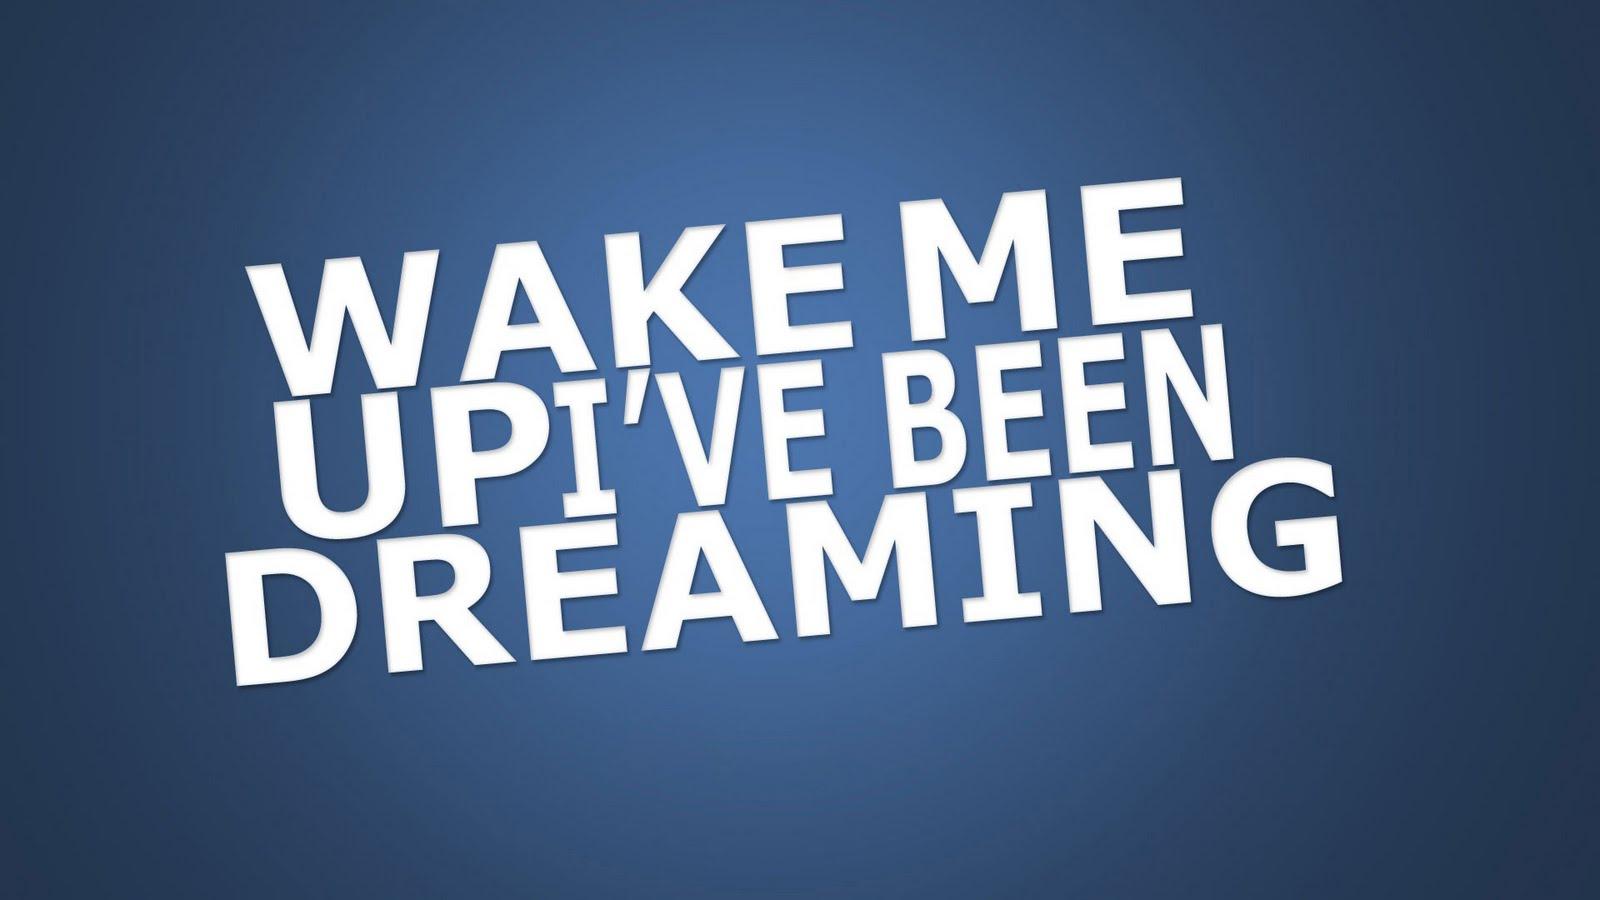 http://2.bp.blogspot.com/-fijdUMN17tU/TktV921DP0I/AAAAAAAAAzM/XdHGVIVaz9Y/s1600/wake-me-up-1080p-hd-wallpaper.jpg